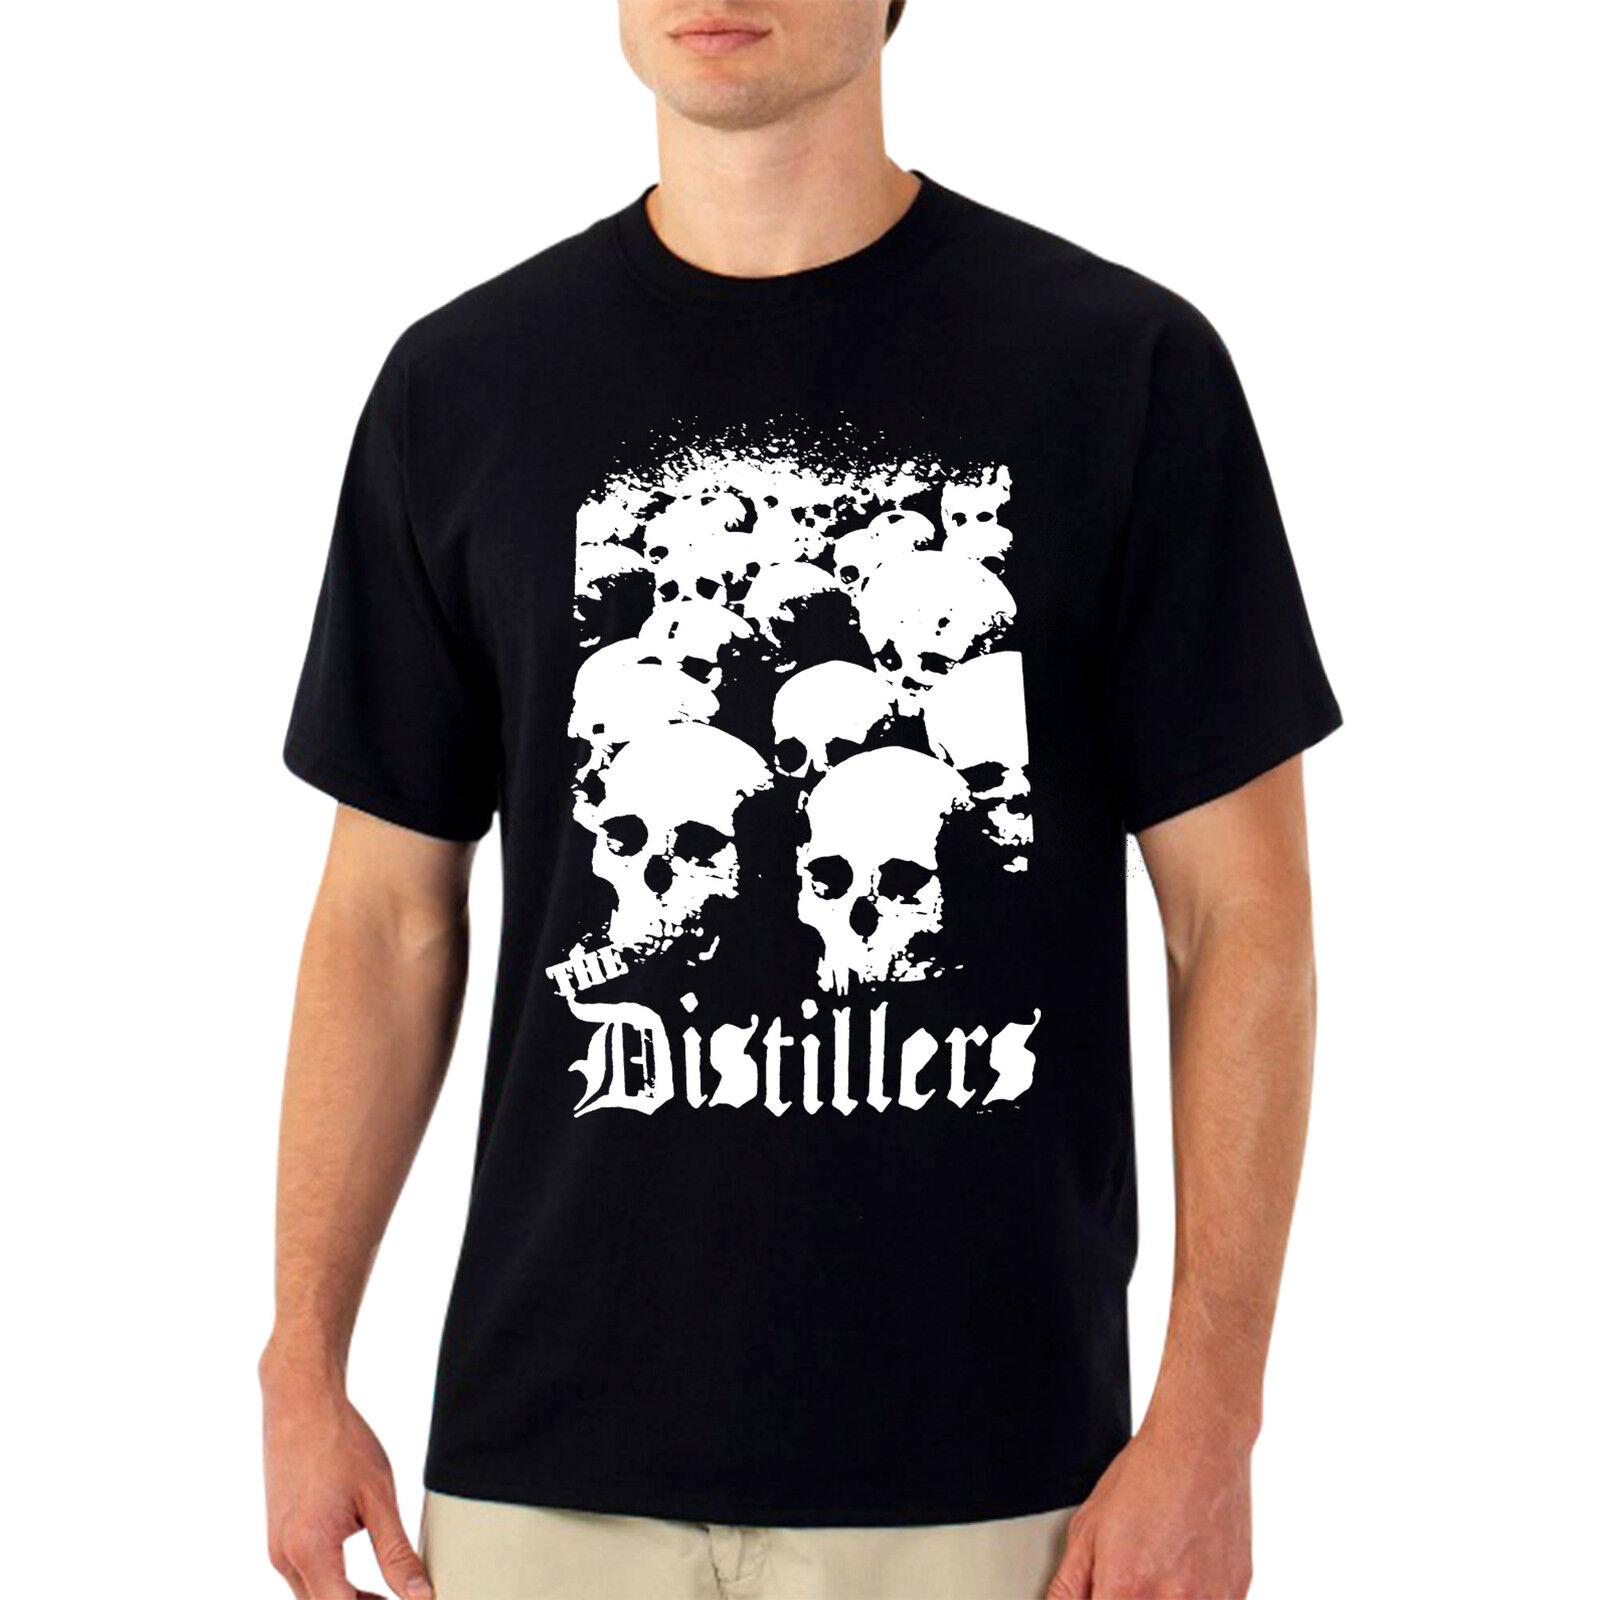 The Distillers City Of Angels Mohawk T Shirt Music Punk Rock QOTSA The Kills 413